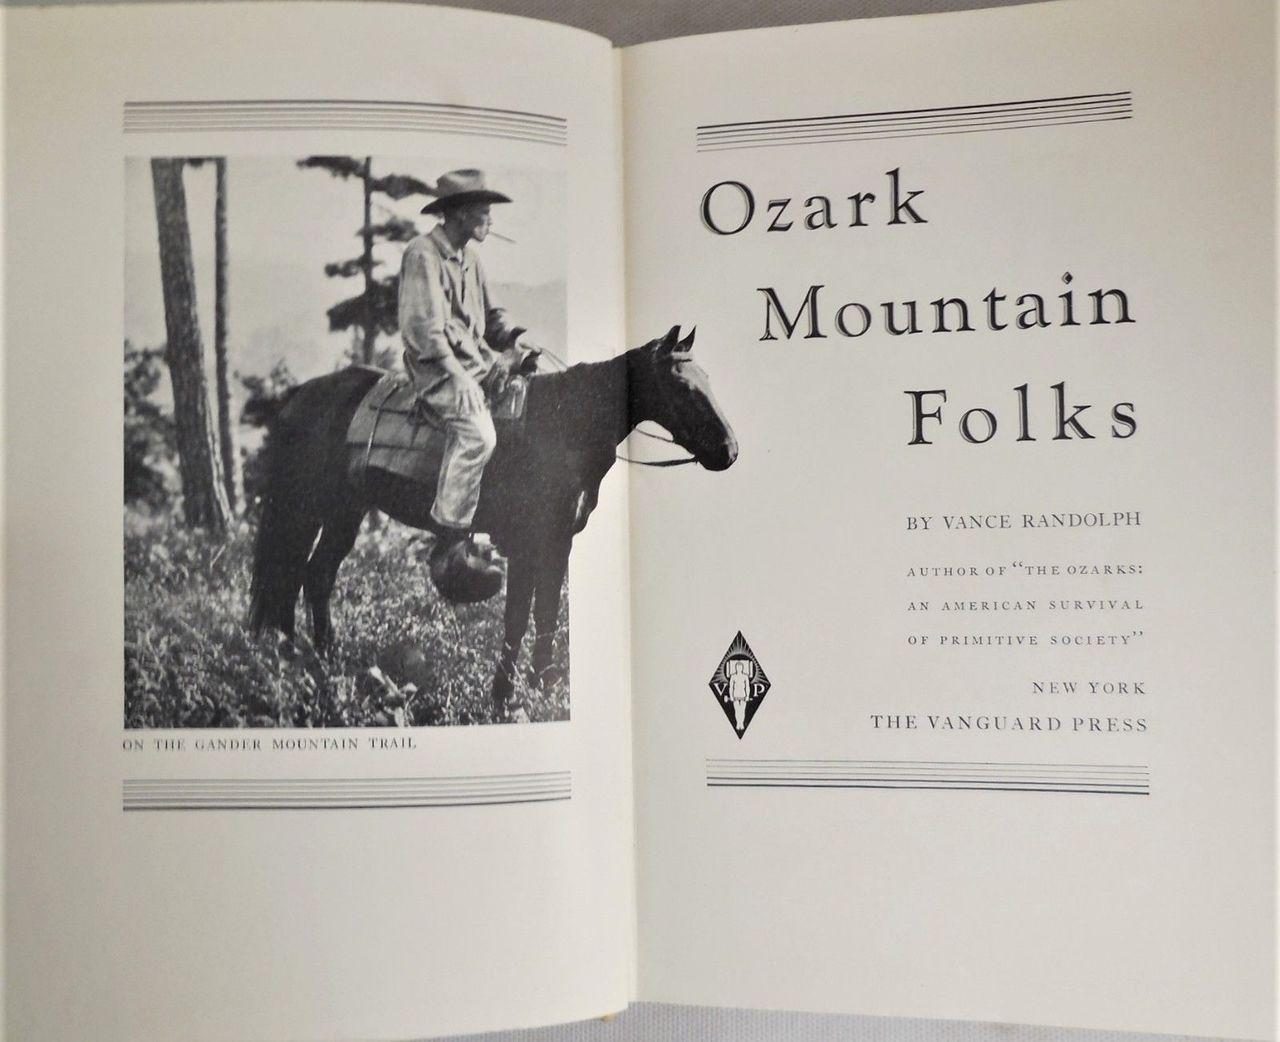 OZARK MOUNTAIN FOLKS, Vance Randolph - 1932 [1st Ed.] American Folklore VG